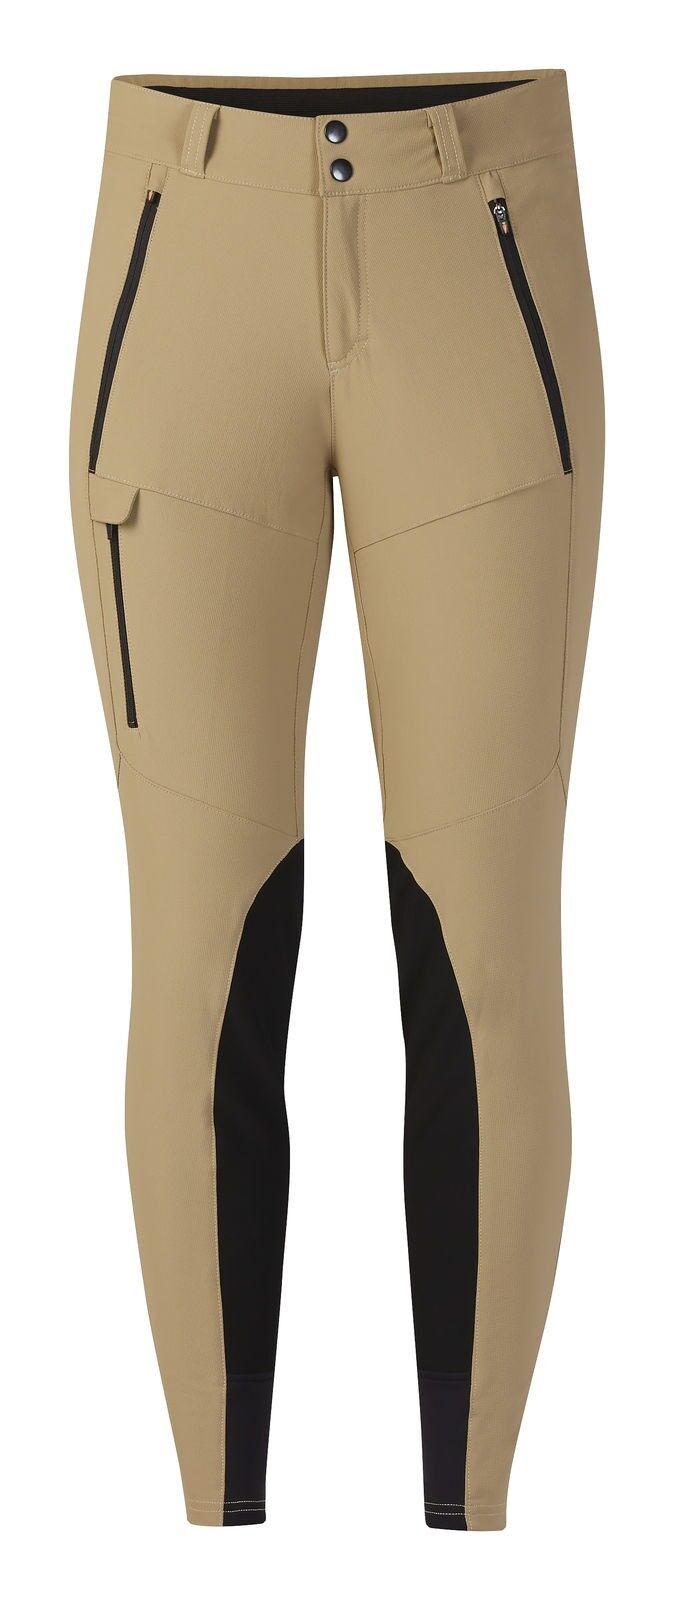 Kerrits Women's Tech Trail Pant Griptek Knee Patch Riding Breeches